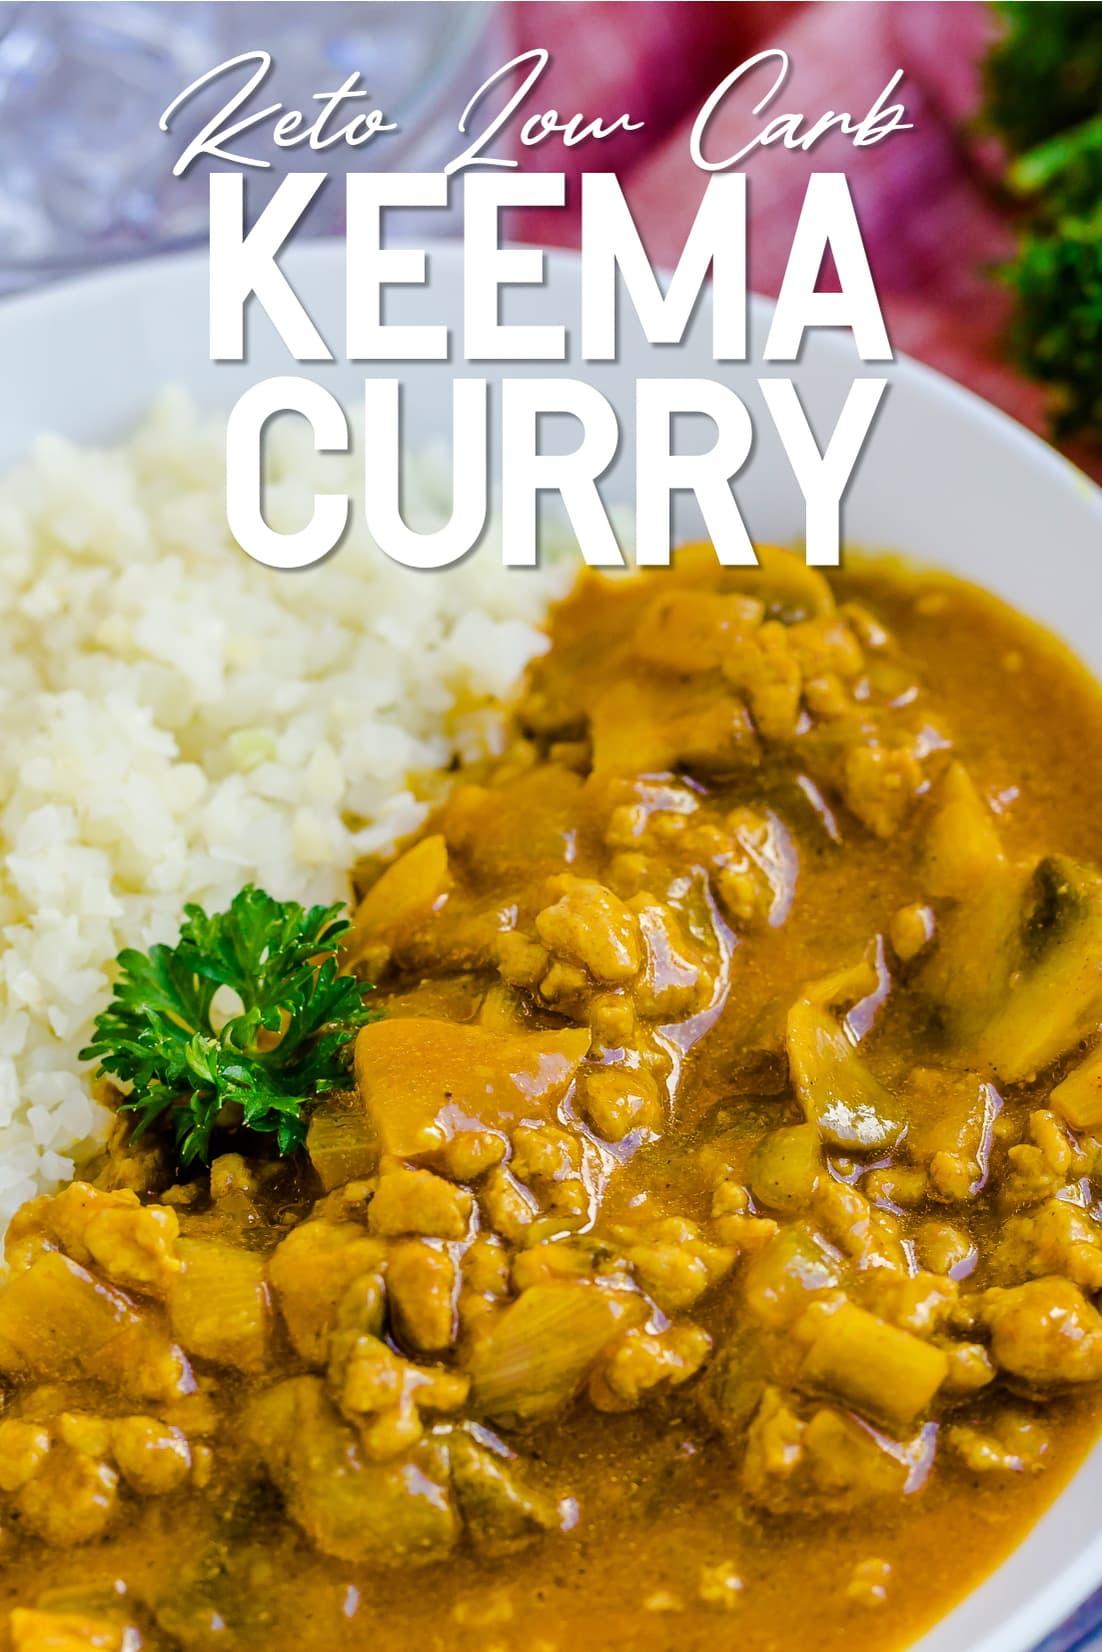 Keto Keema Cauliflower Curry served in a white bowl with cauliflower rice